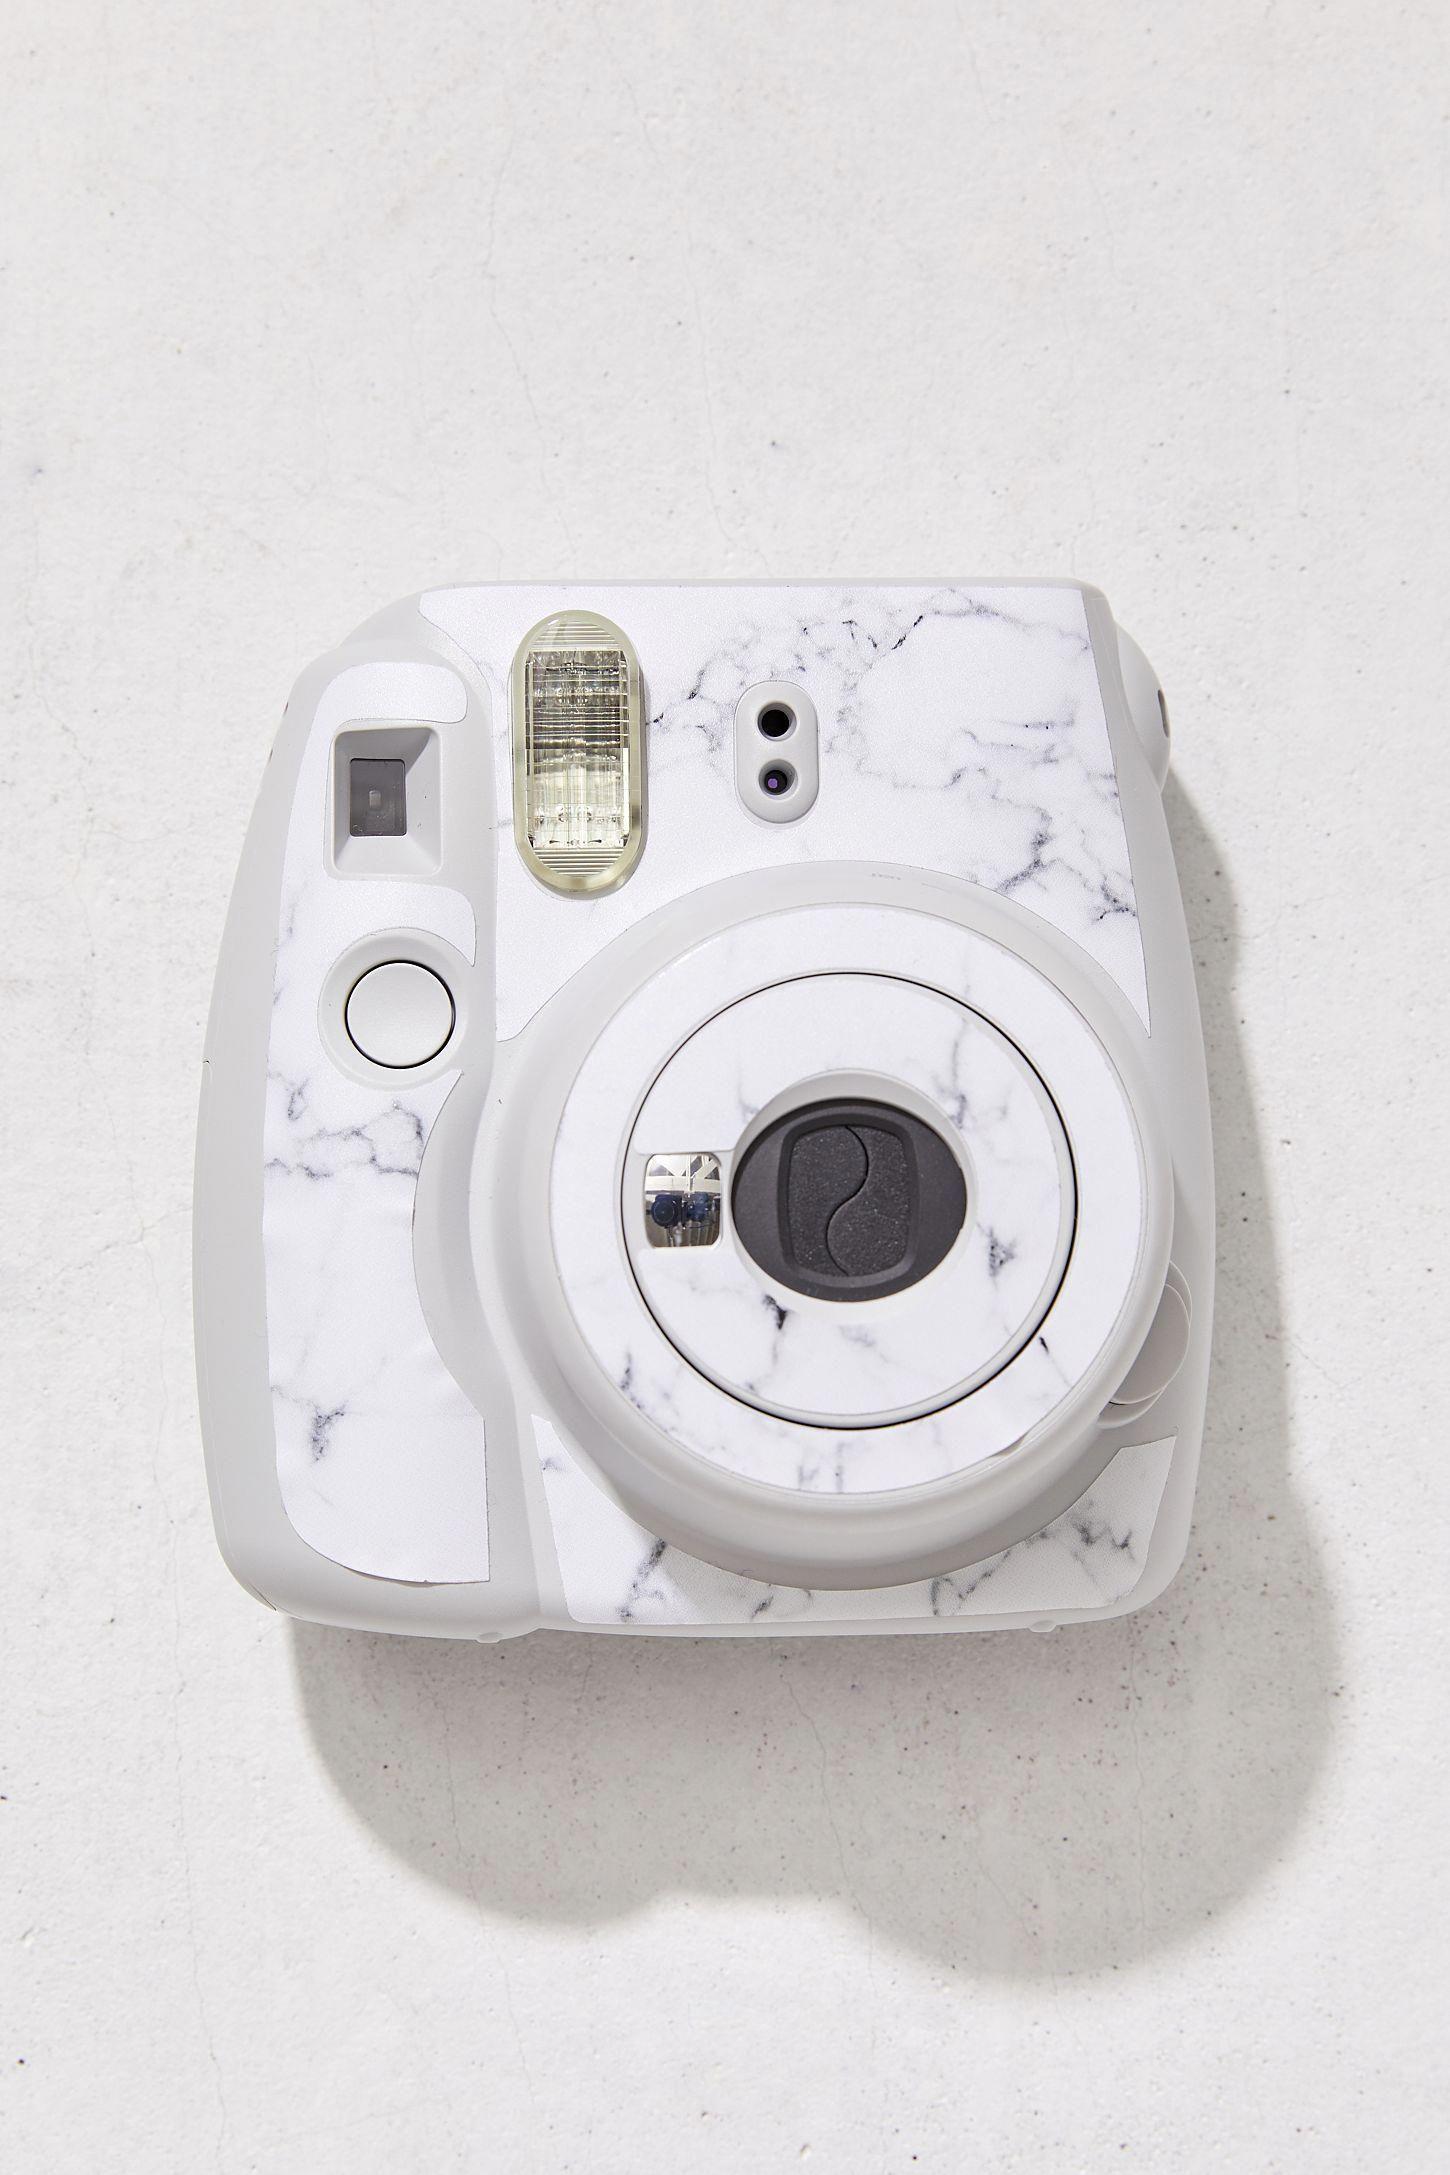 Gewaltkamera Dslr Digital Slr #dslrofficial #PhotographyGearArt